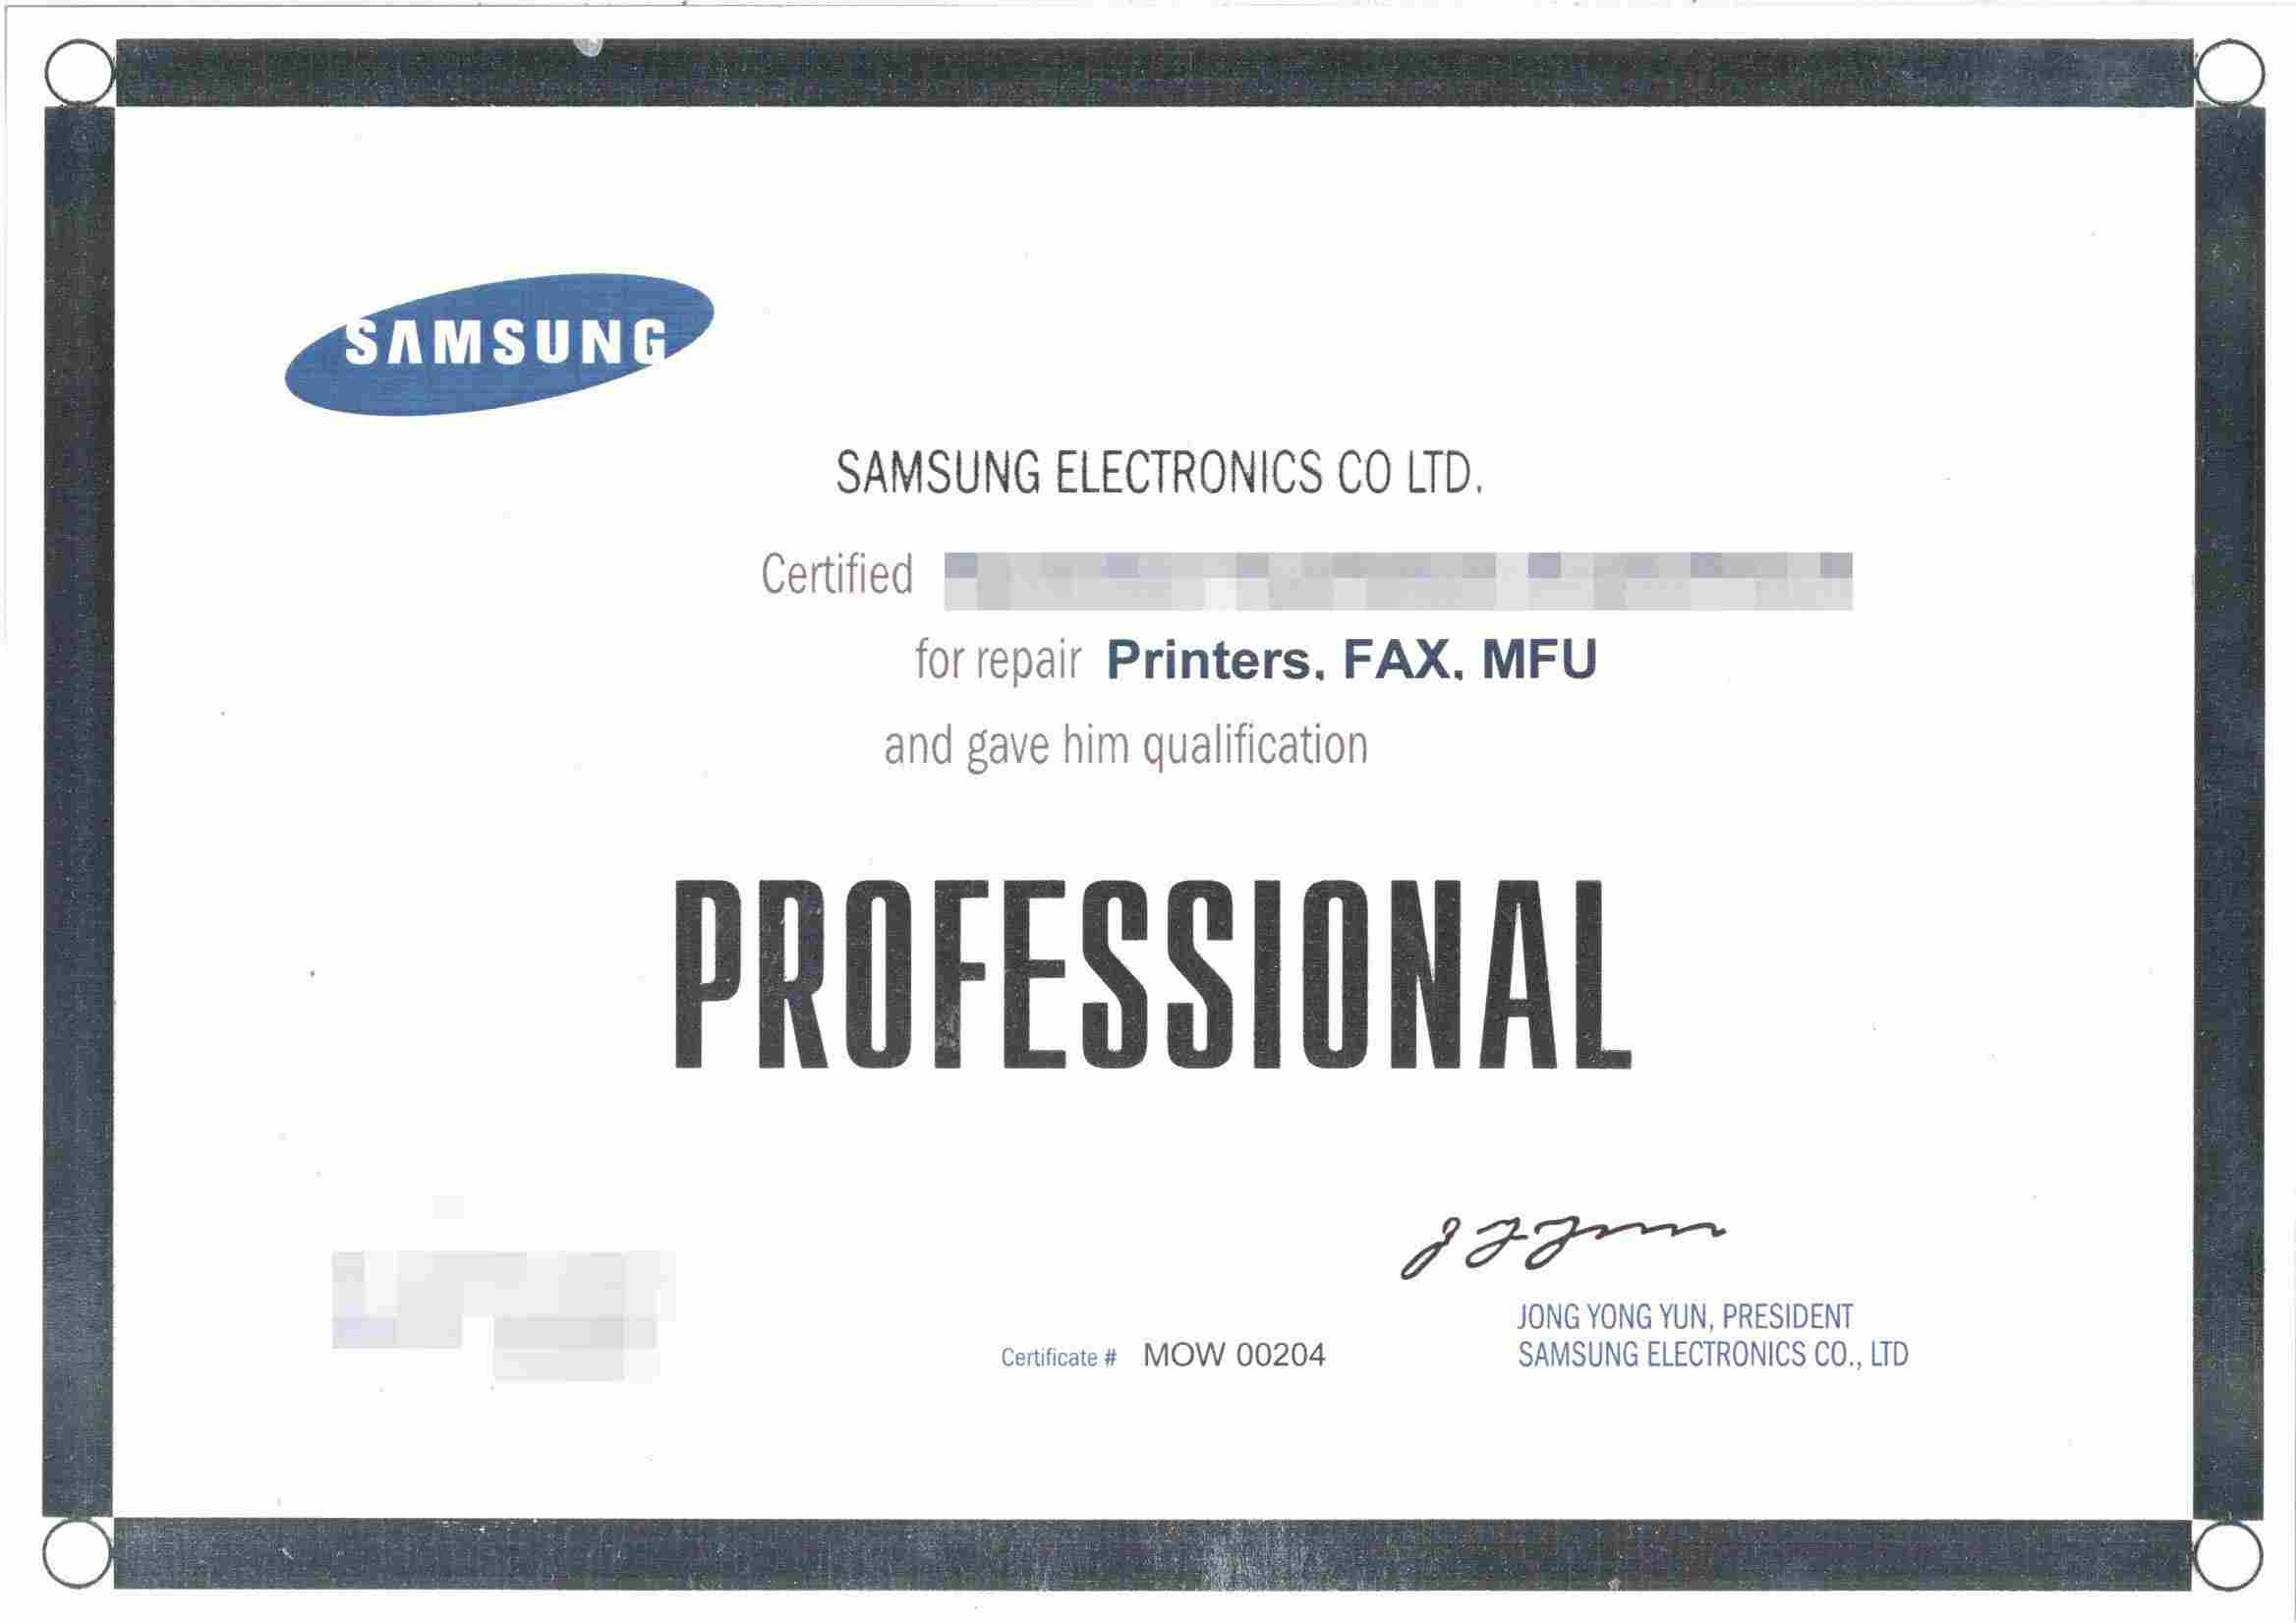 сертификат сервисного инженера